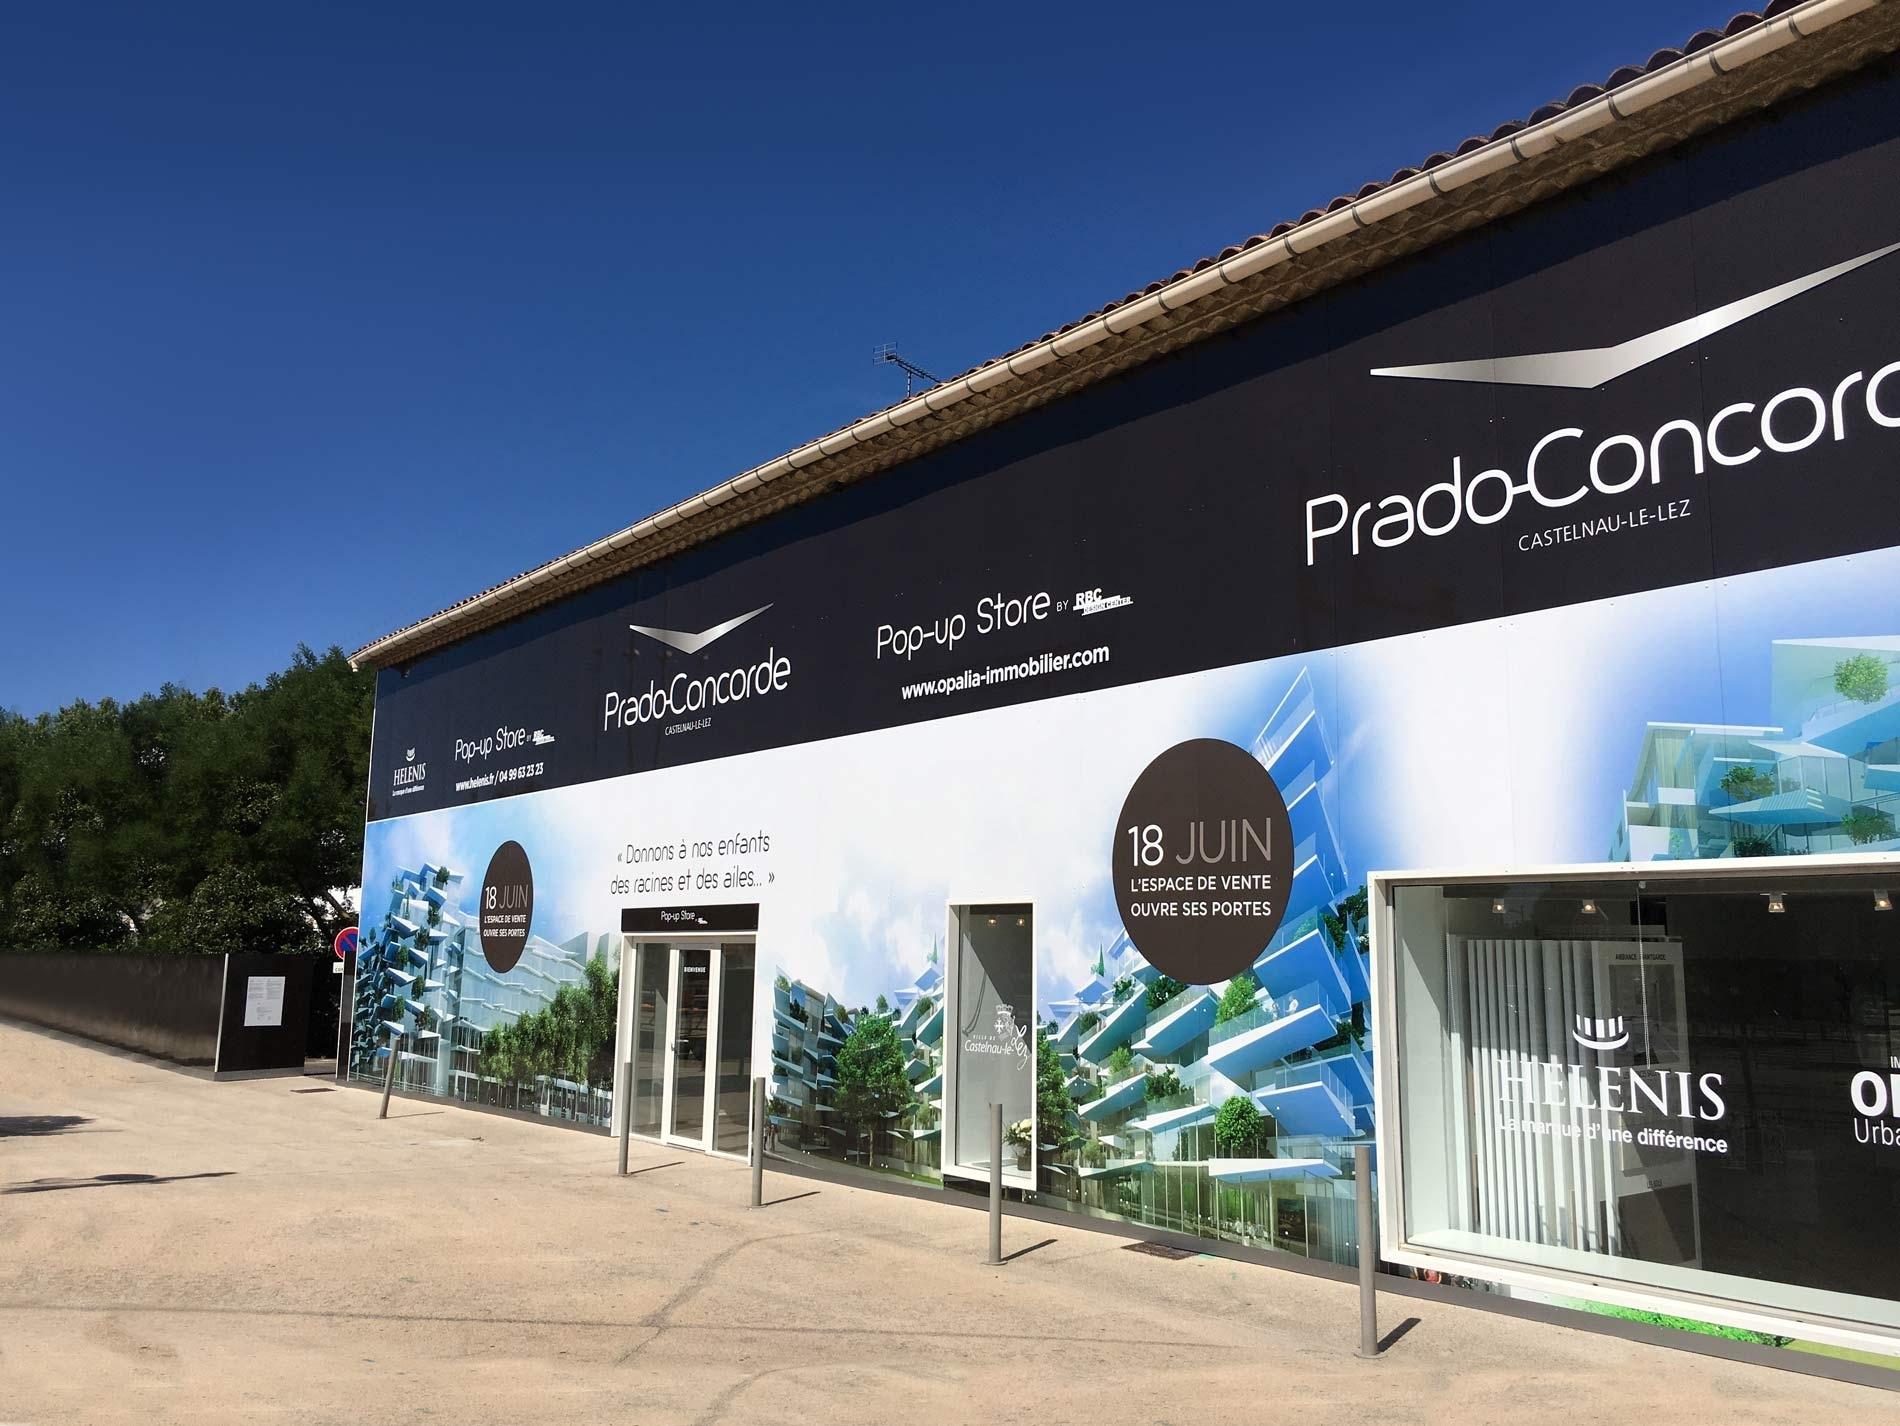 Prado Concorde - Castelnau le Lez